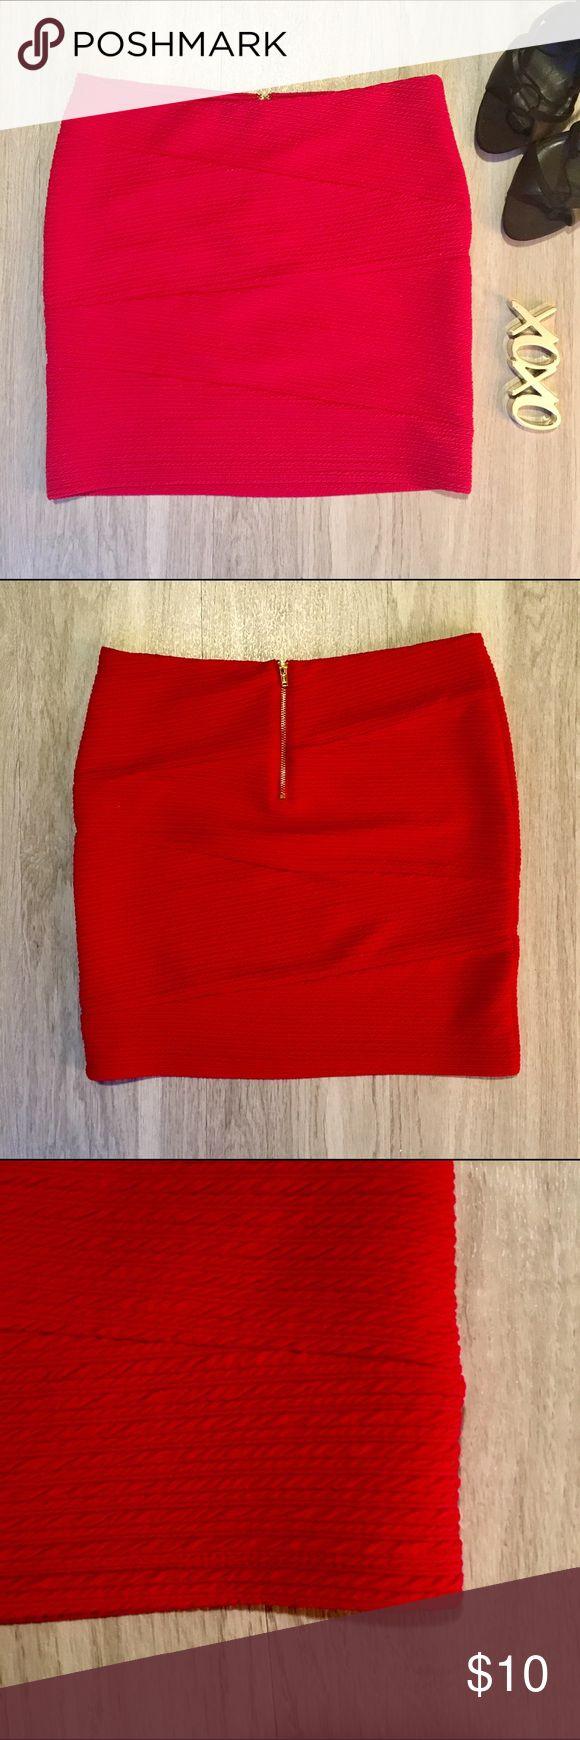 17 Best ideas about Red Mini Skirt on Pinterest | Plaid mini skirt ...